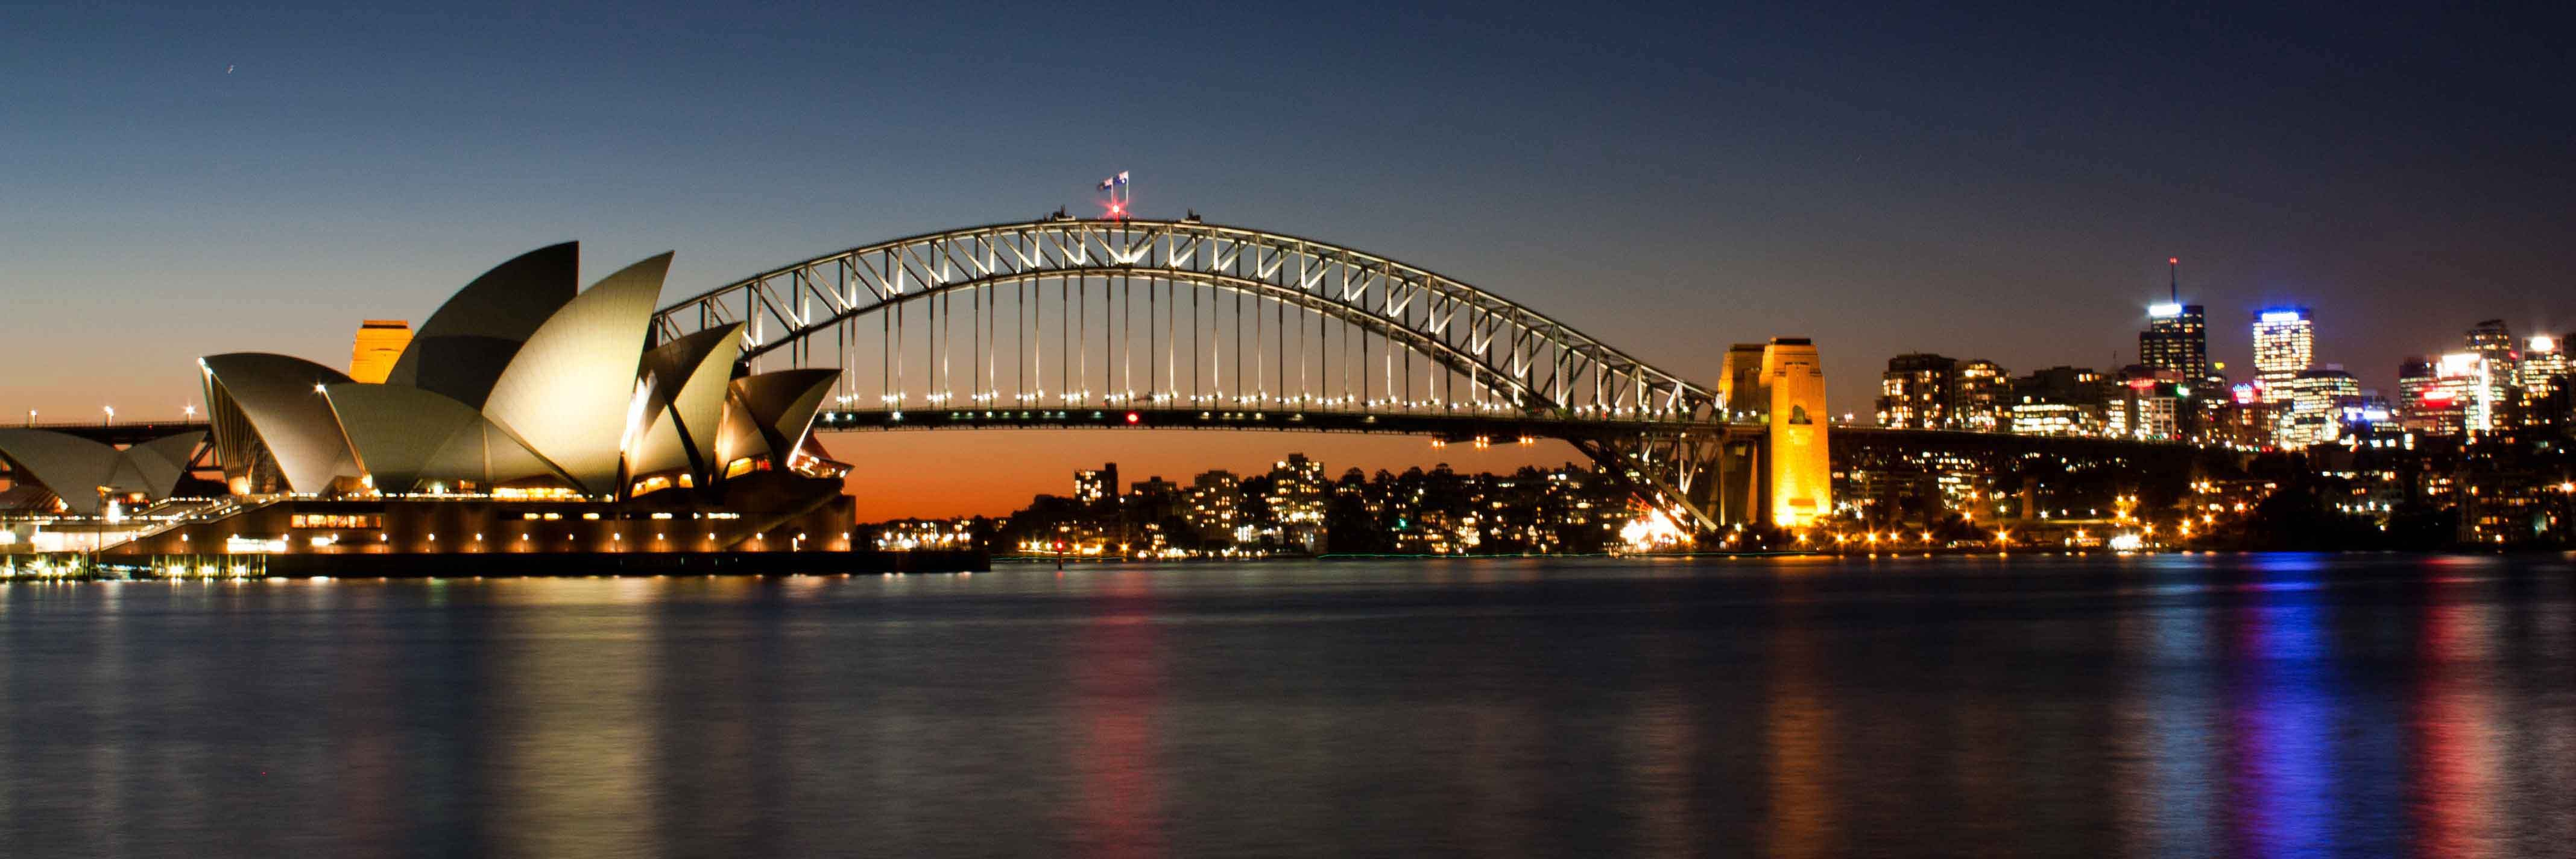 Matrimonial australia sydney